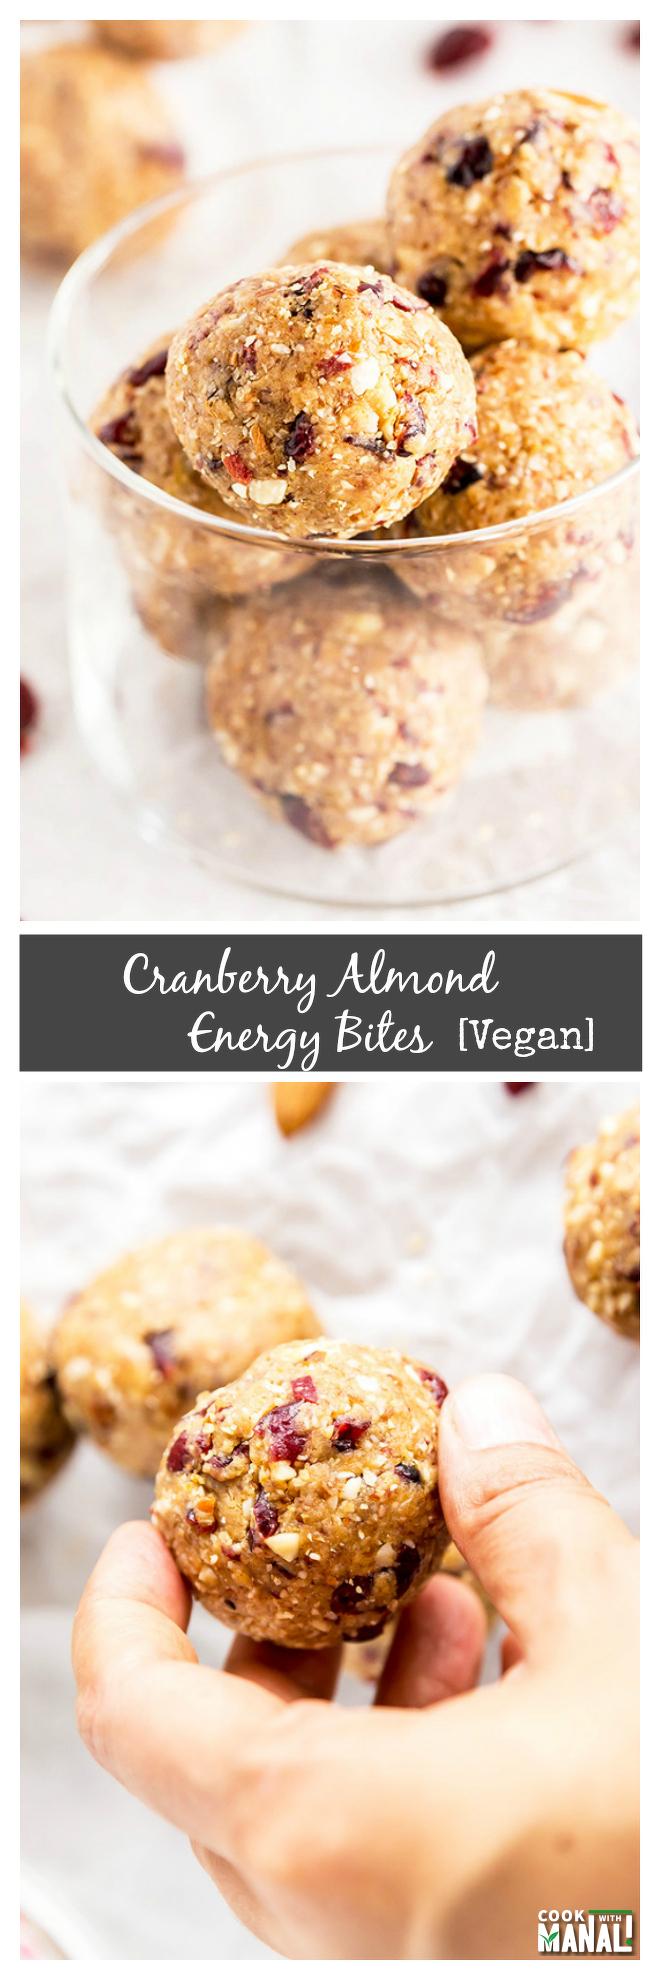 no-bake-cranberry-almond-energy-bites-collage